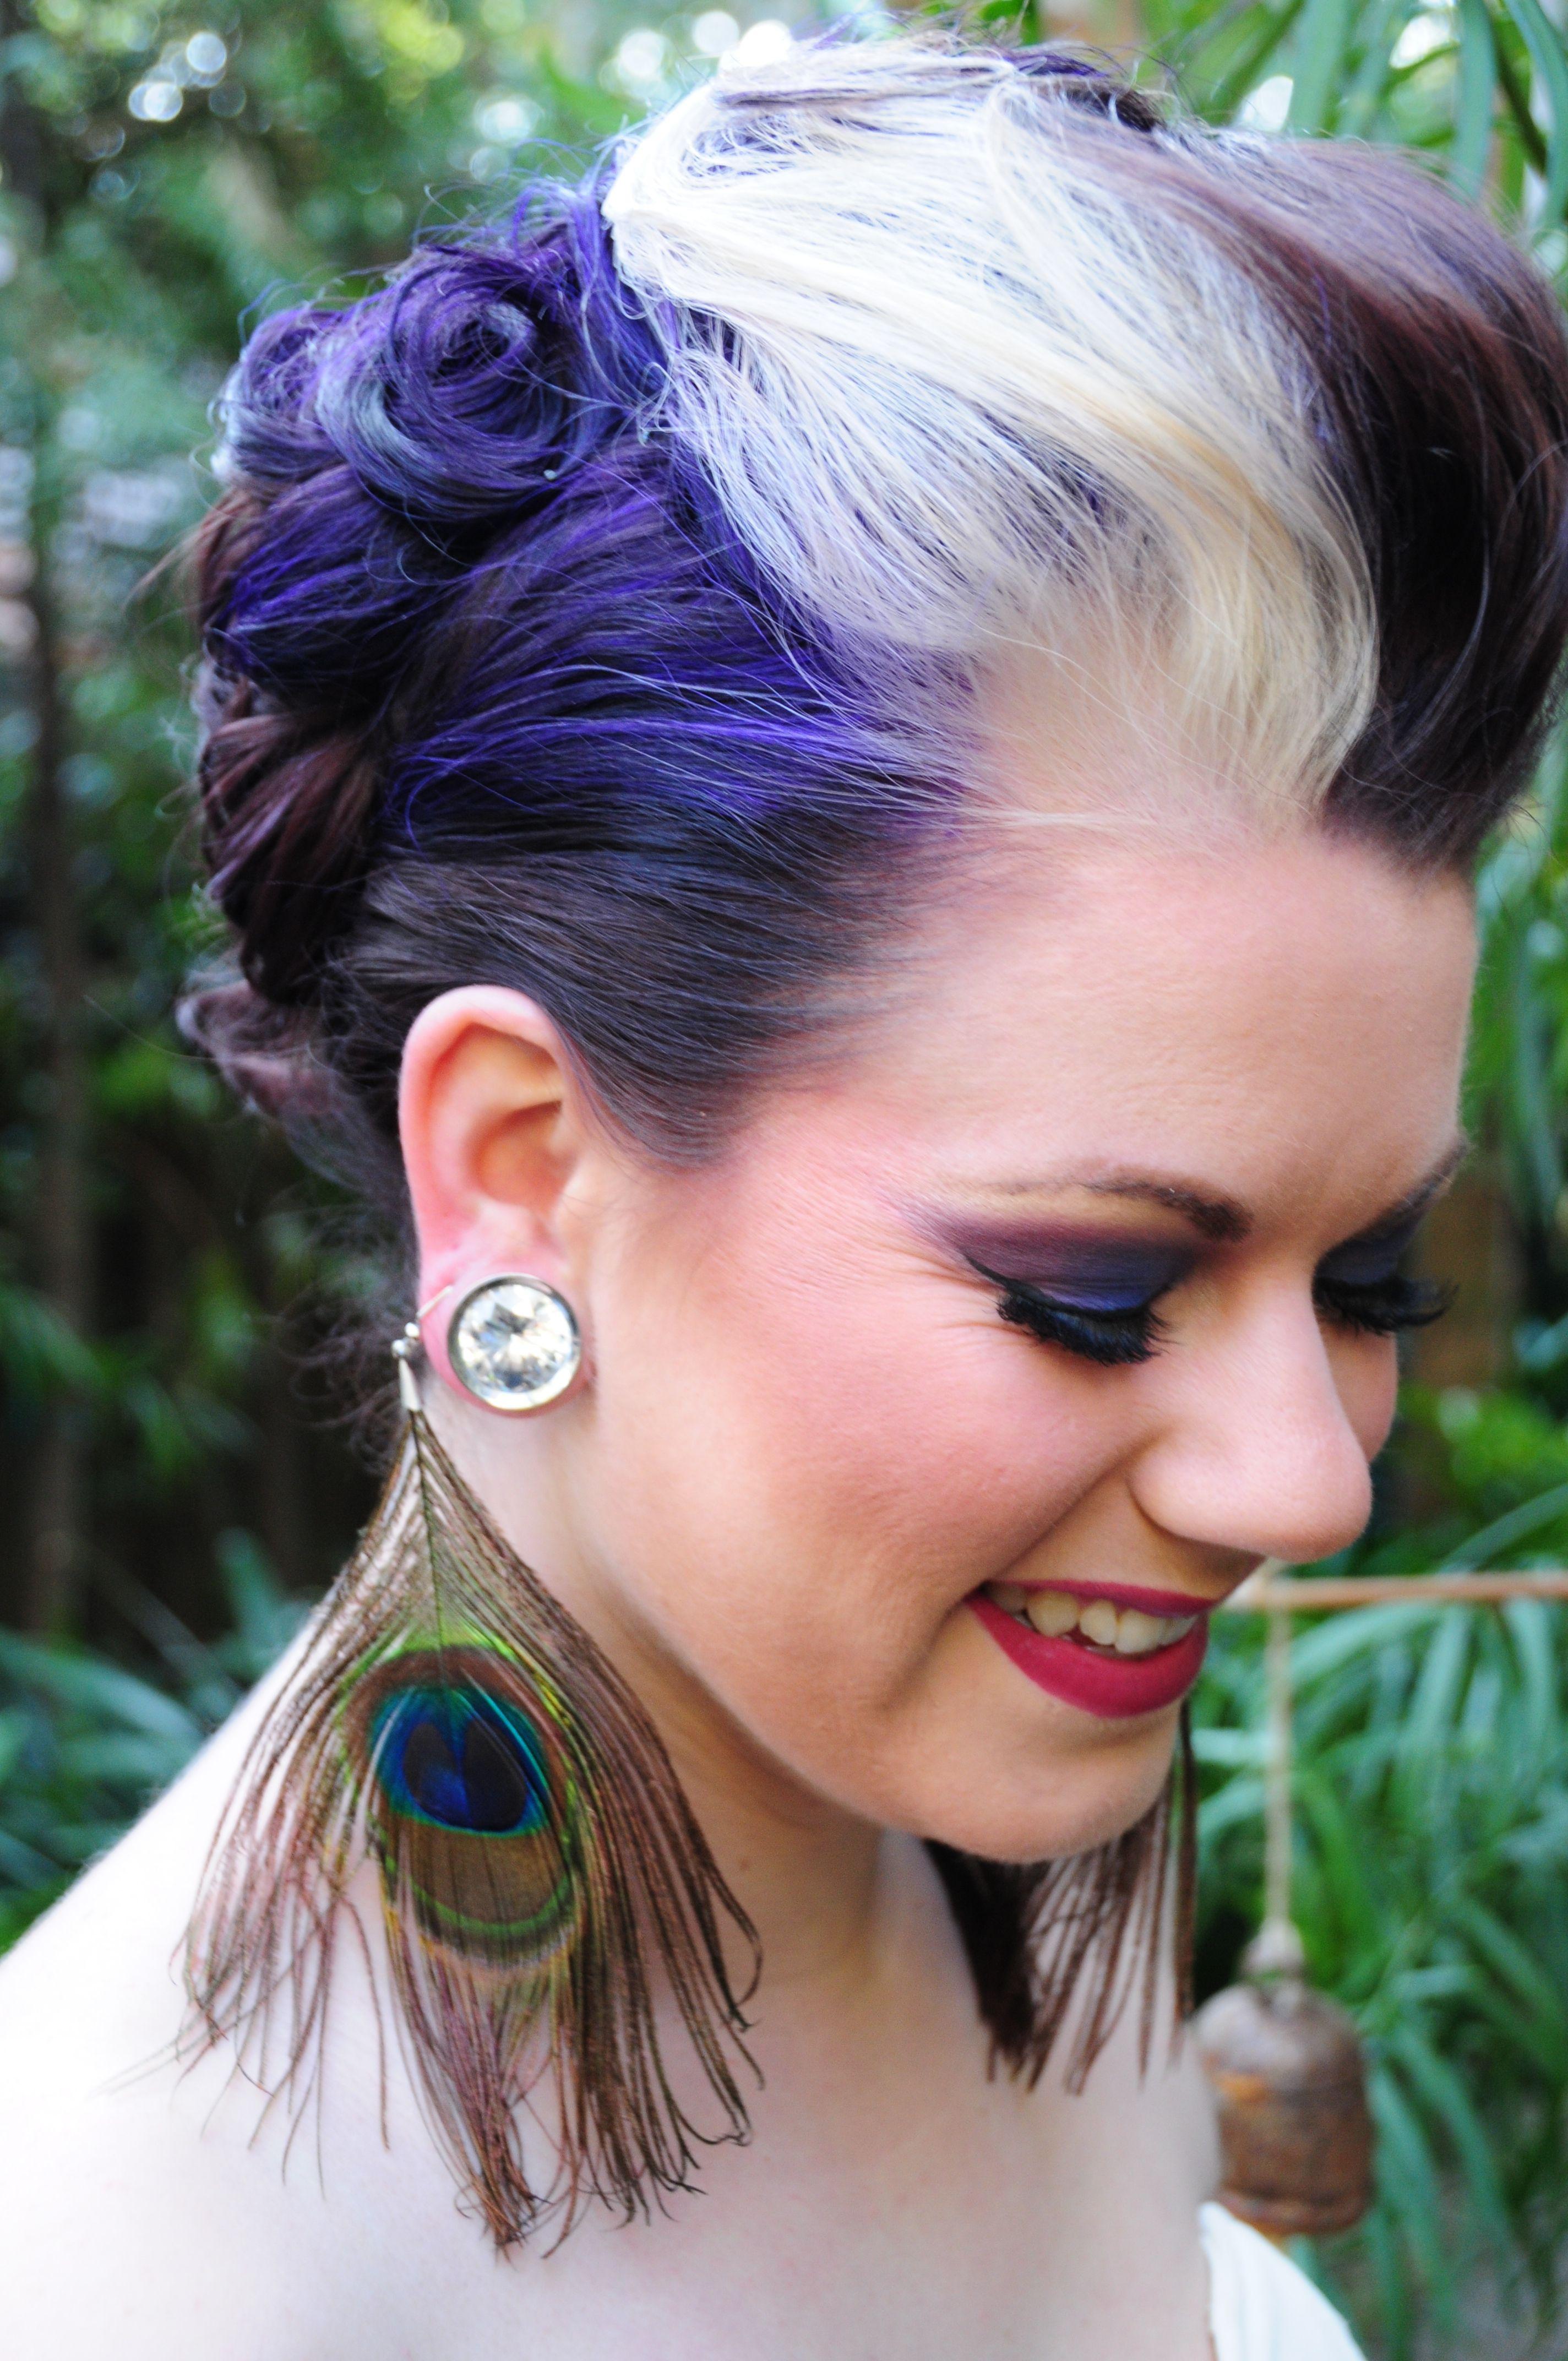 purple hair platinum blonde streak updo fohwak femhawk